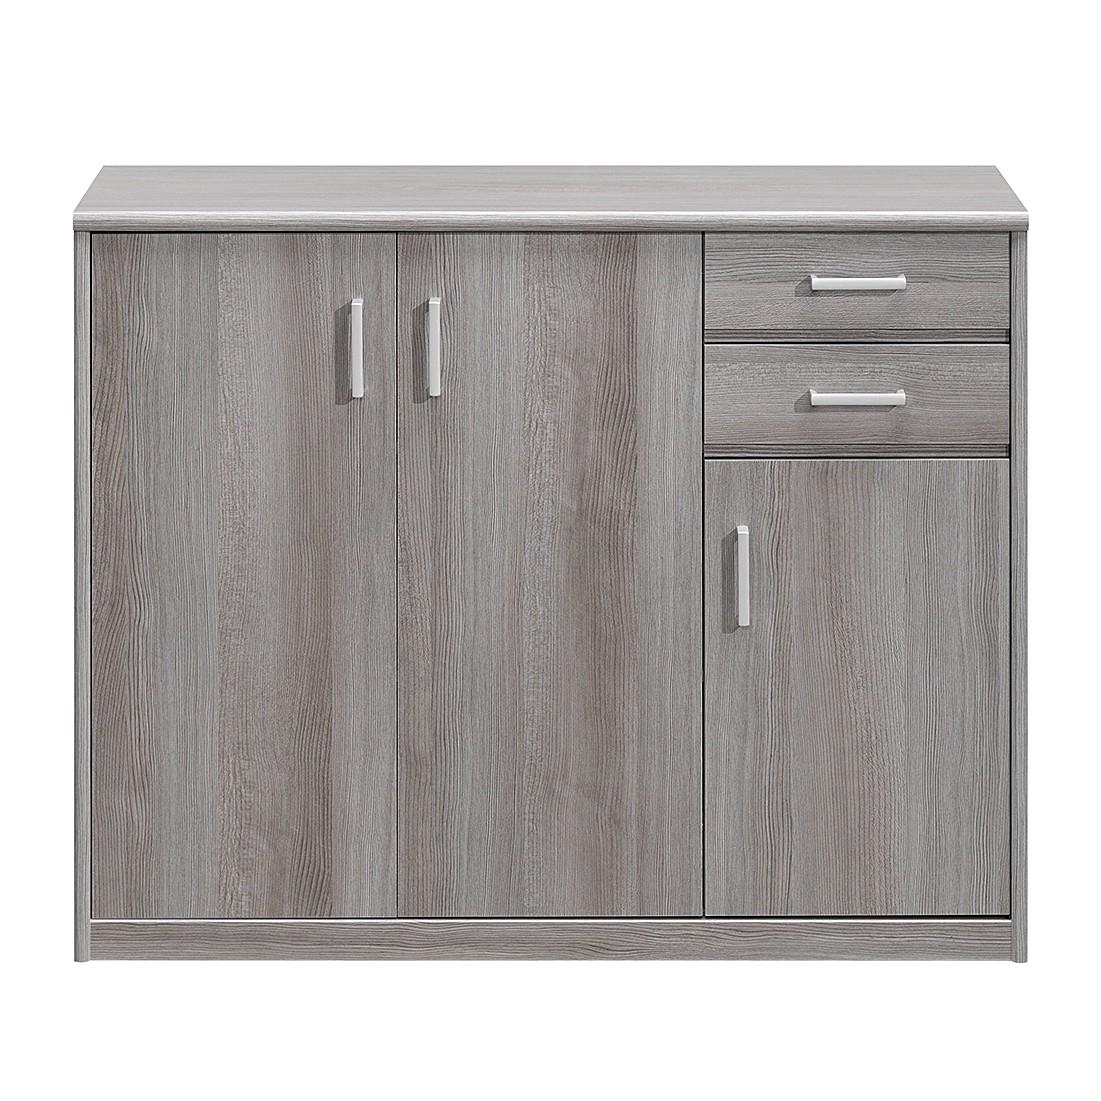 Home 24 - Commode à tiroirs soft plus iii - imitation chêne cendré, cs schmal